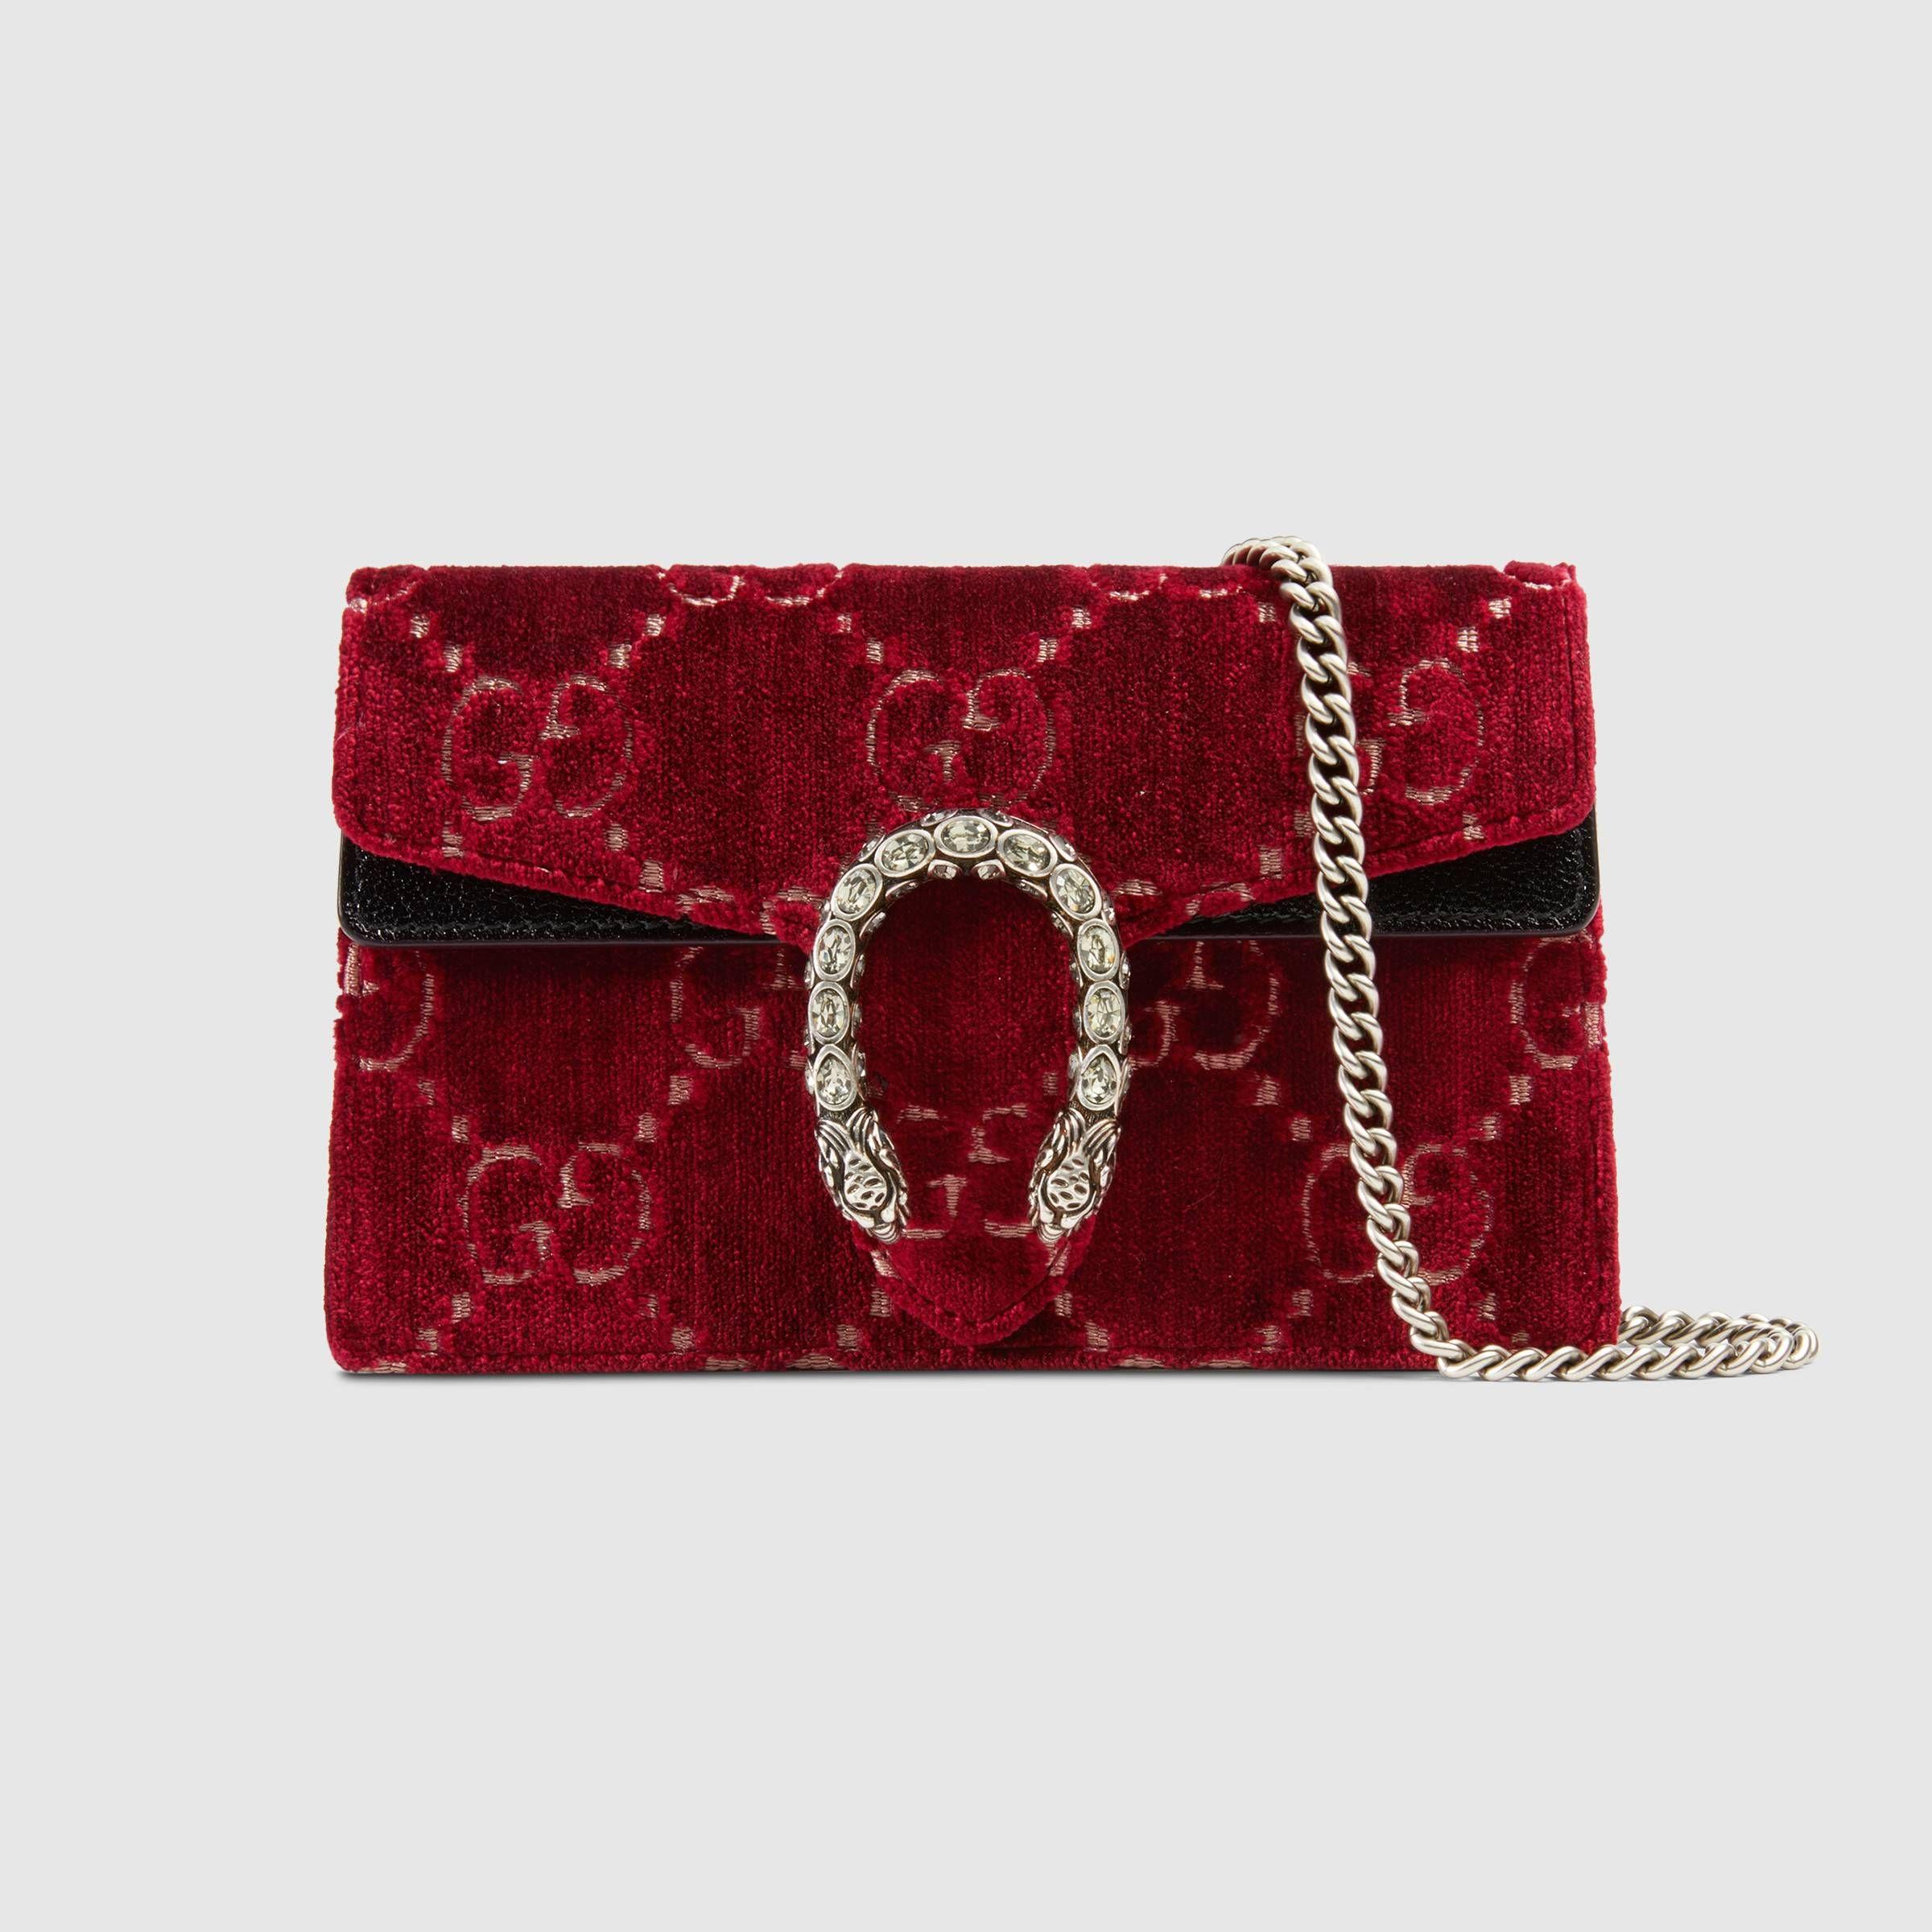 41b28bfa84a Dionysus GG velvet super mini bag in Red and beige GG velvet with black  patent leather trim